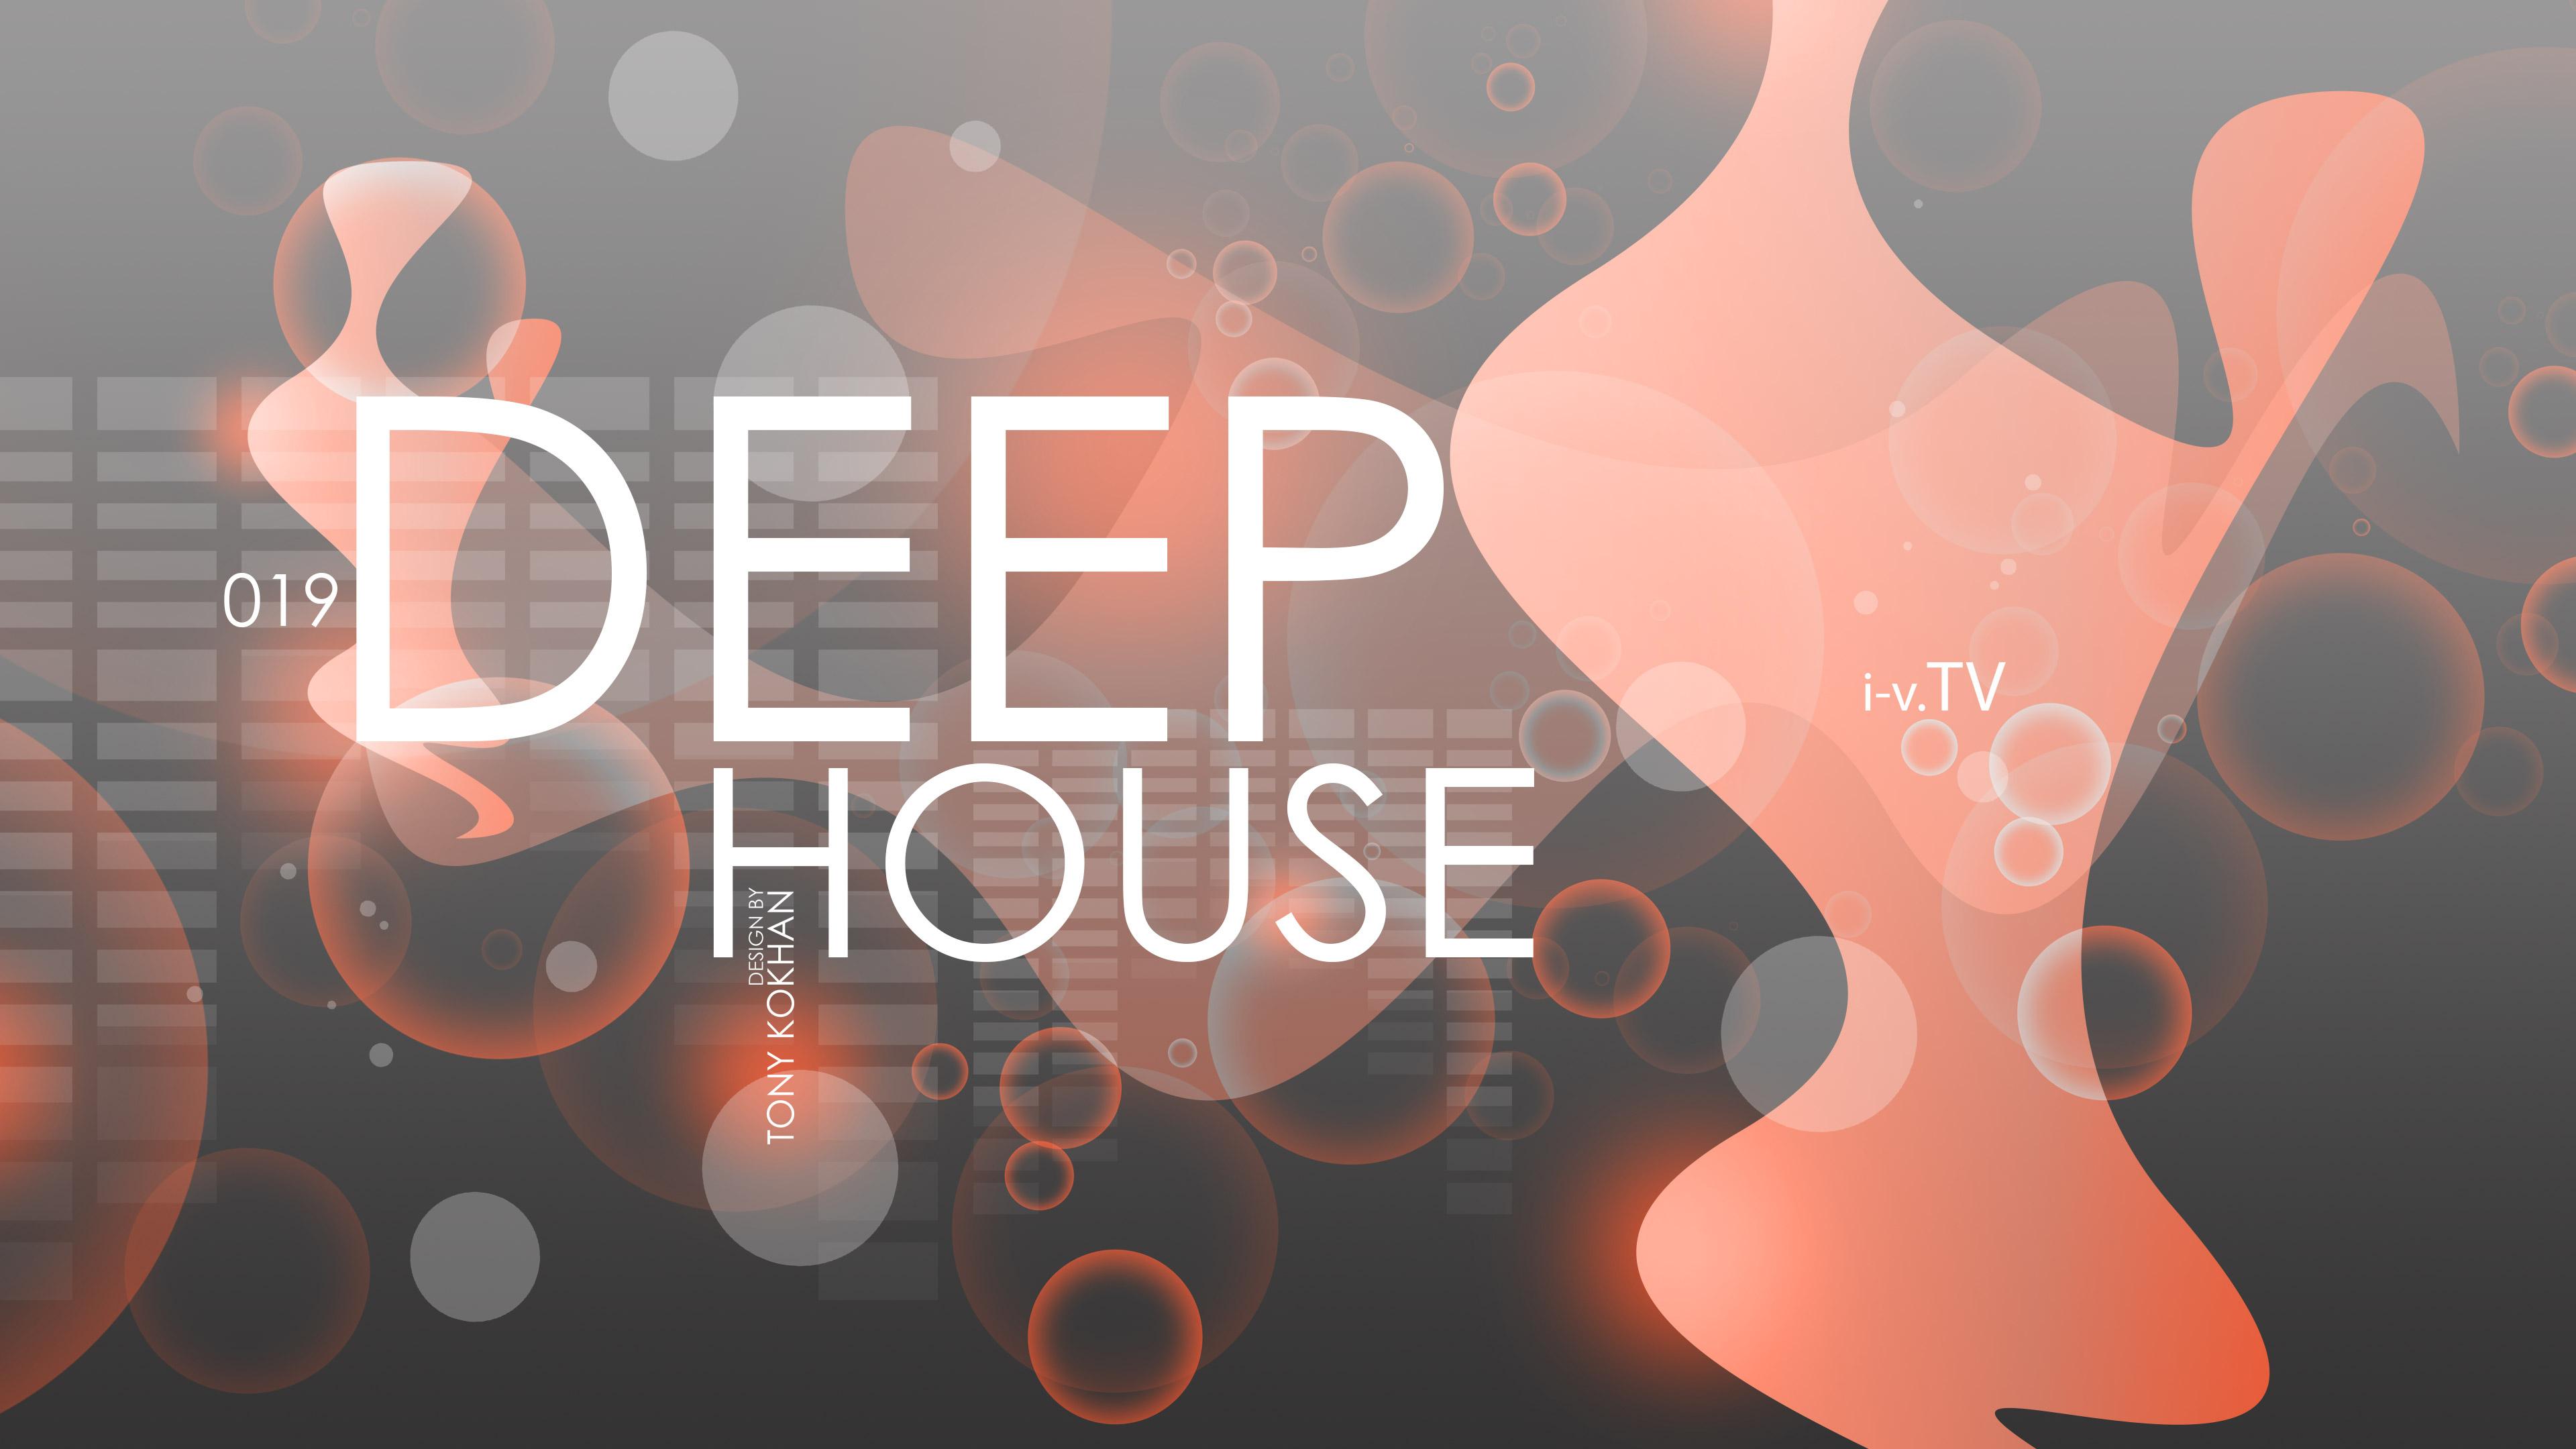 Deep House Music eQ Simple Creative Nineteen Abstract 3840x2160